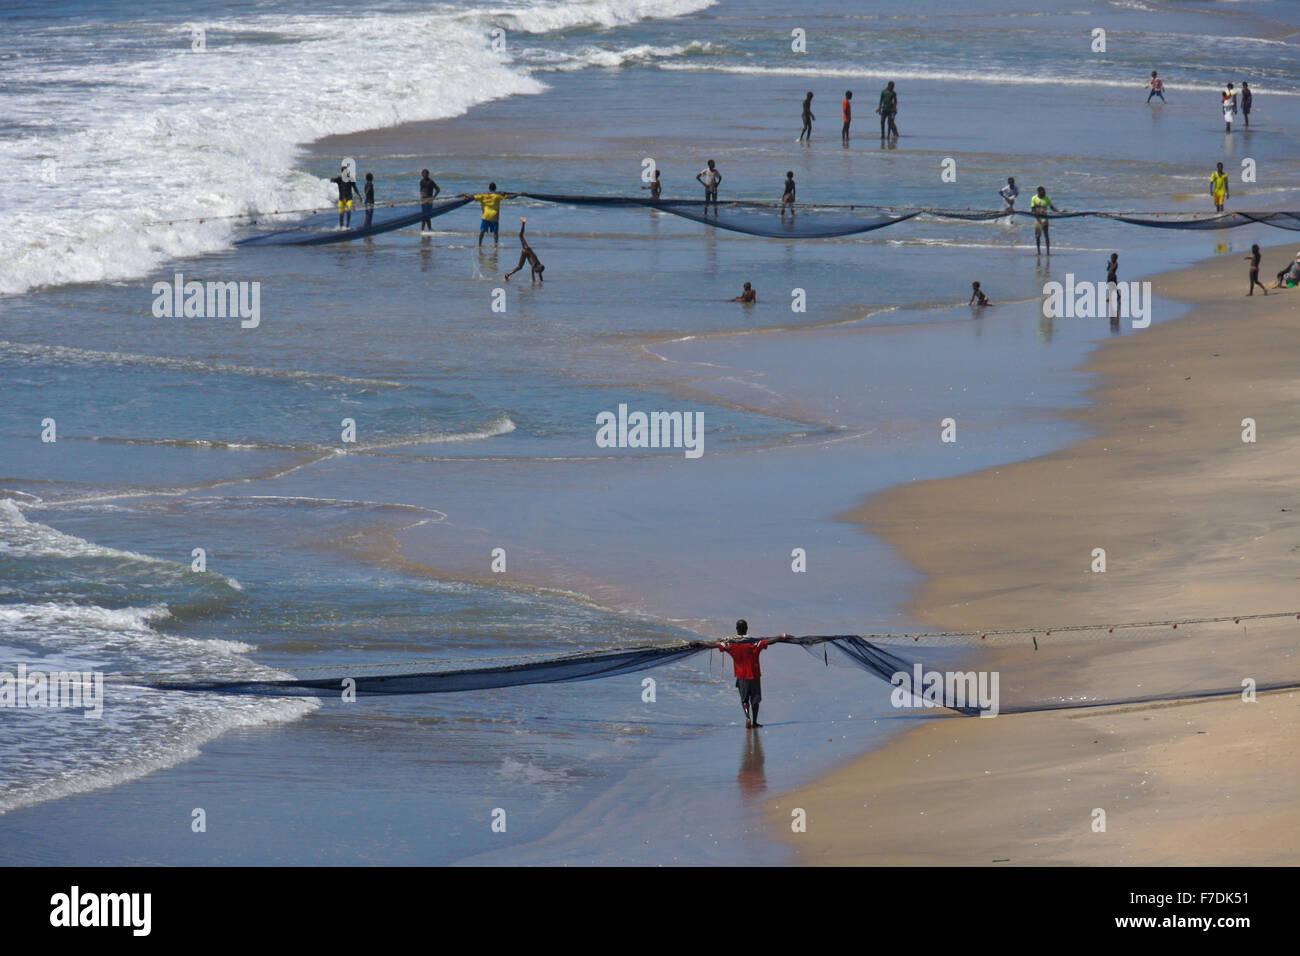 Fishermen hauling in nets, Cape Coast, Ghana - Stock Image